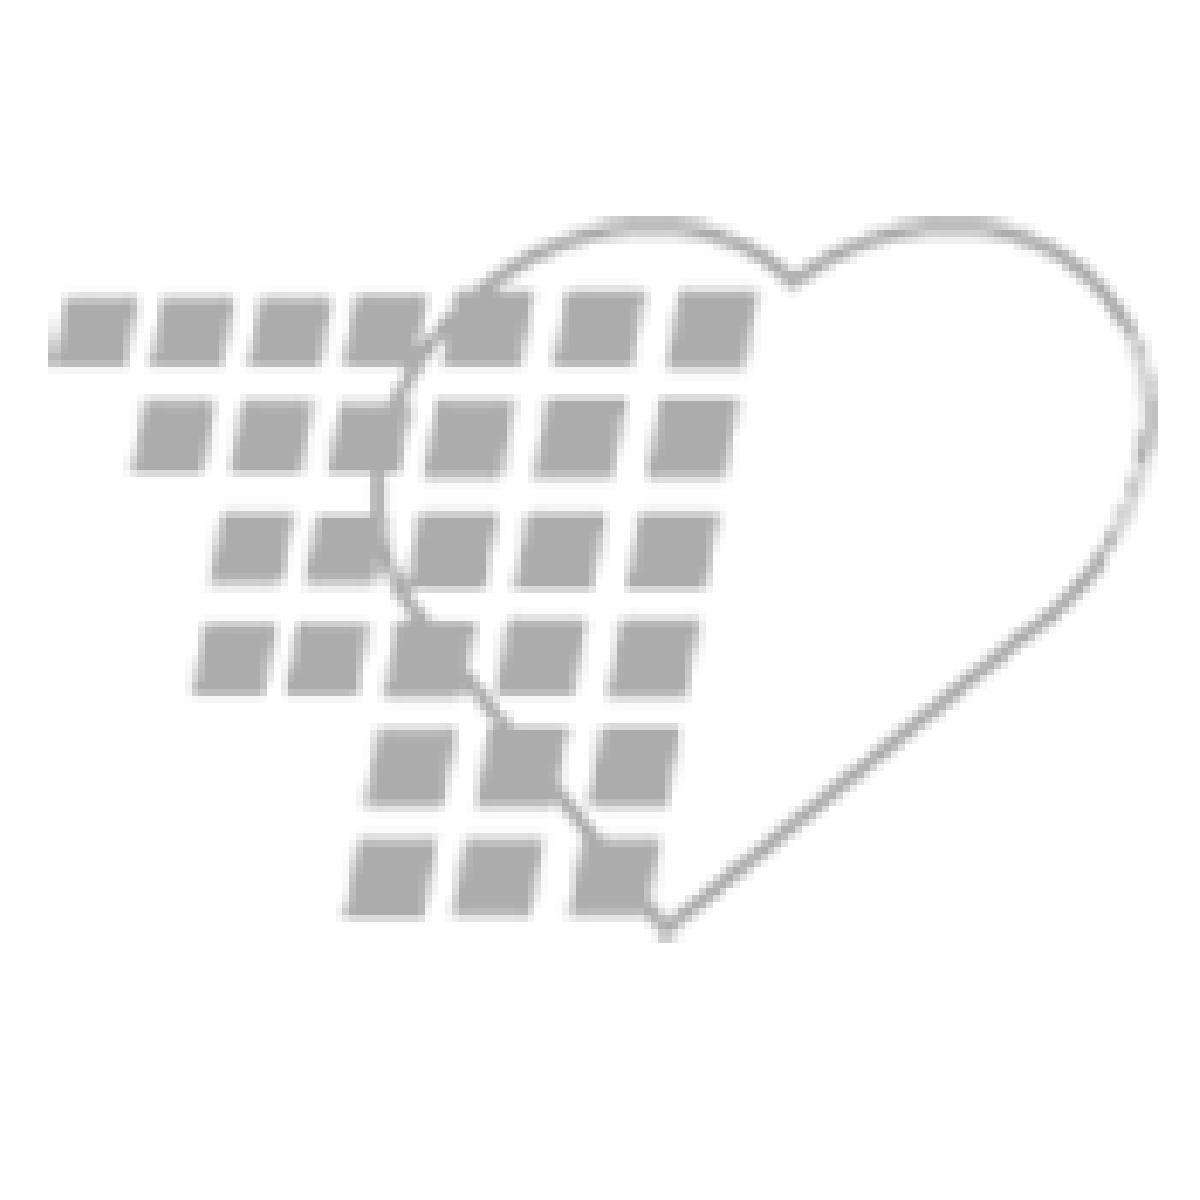 02-80-660 ADC Proscope™ Single Head Stethoscope